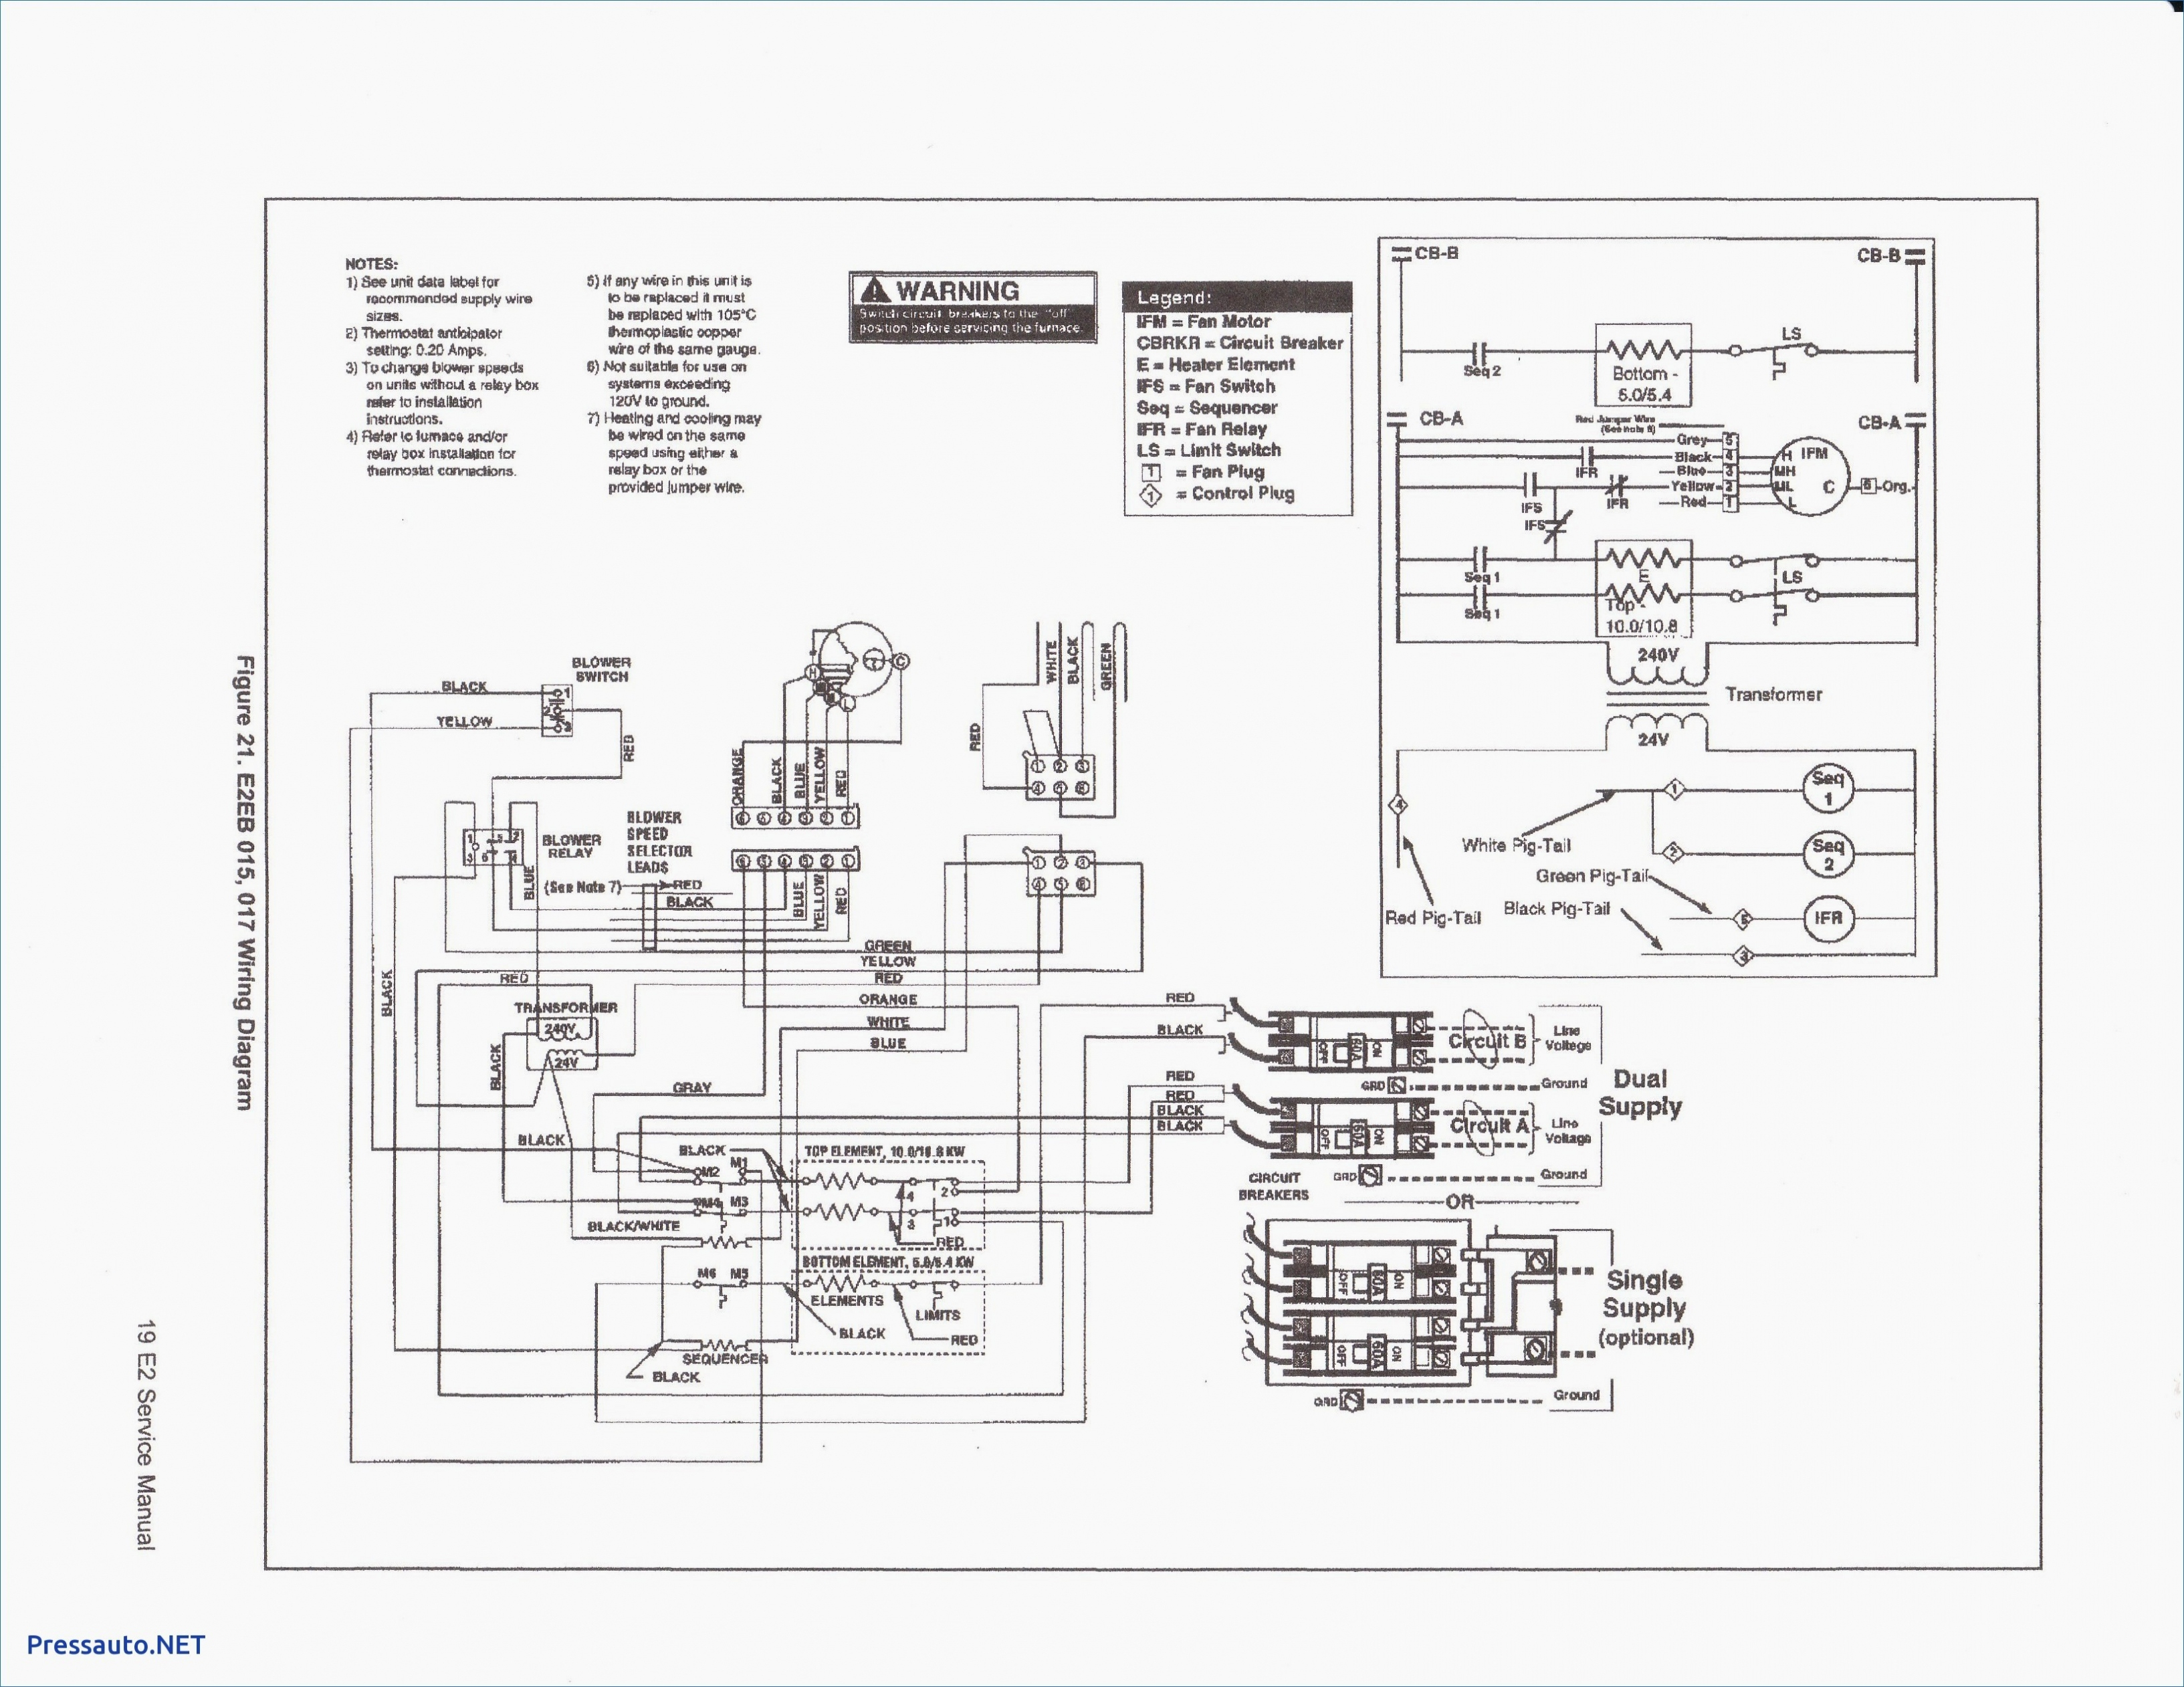 Goodman Furnace Thermostat Wiring Diagram 100 4 - Wiring Diagrams Hubs - Goodman Furnace Wiring Diagram